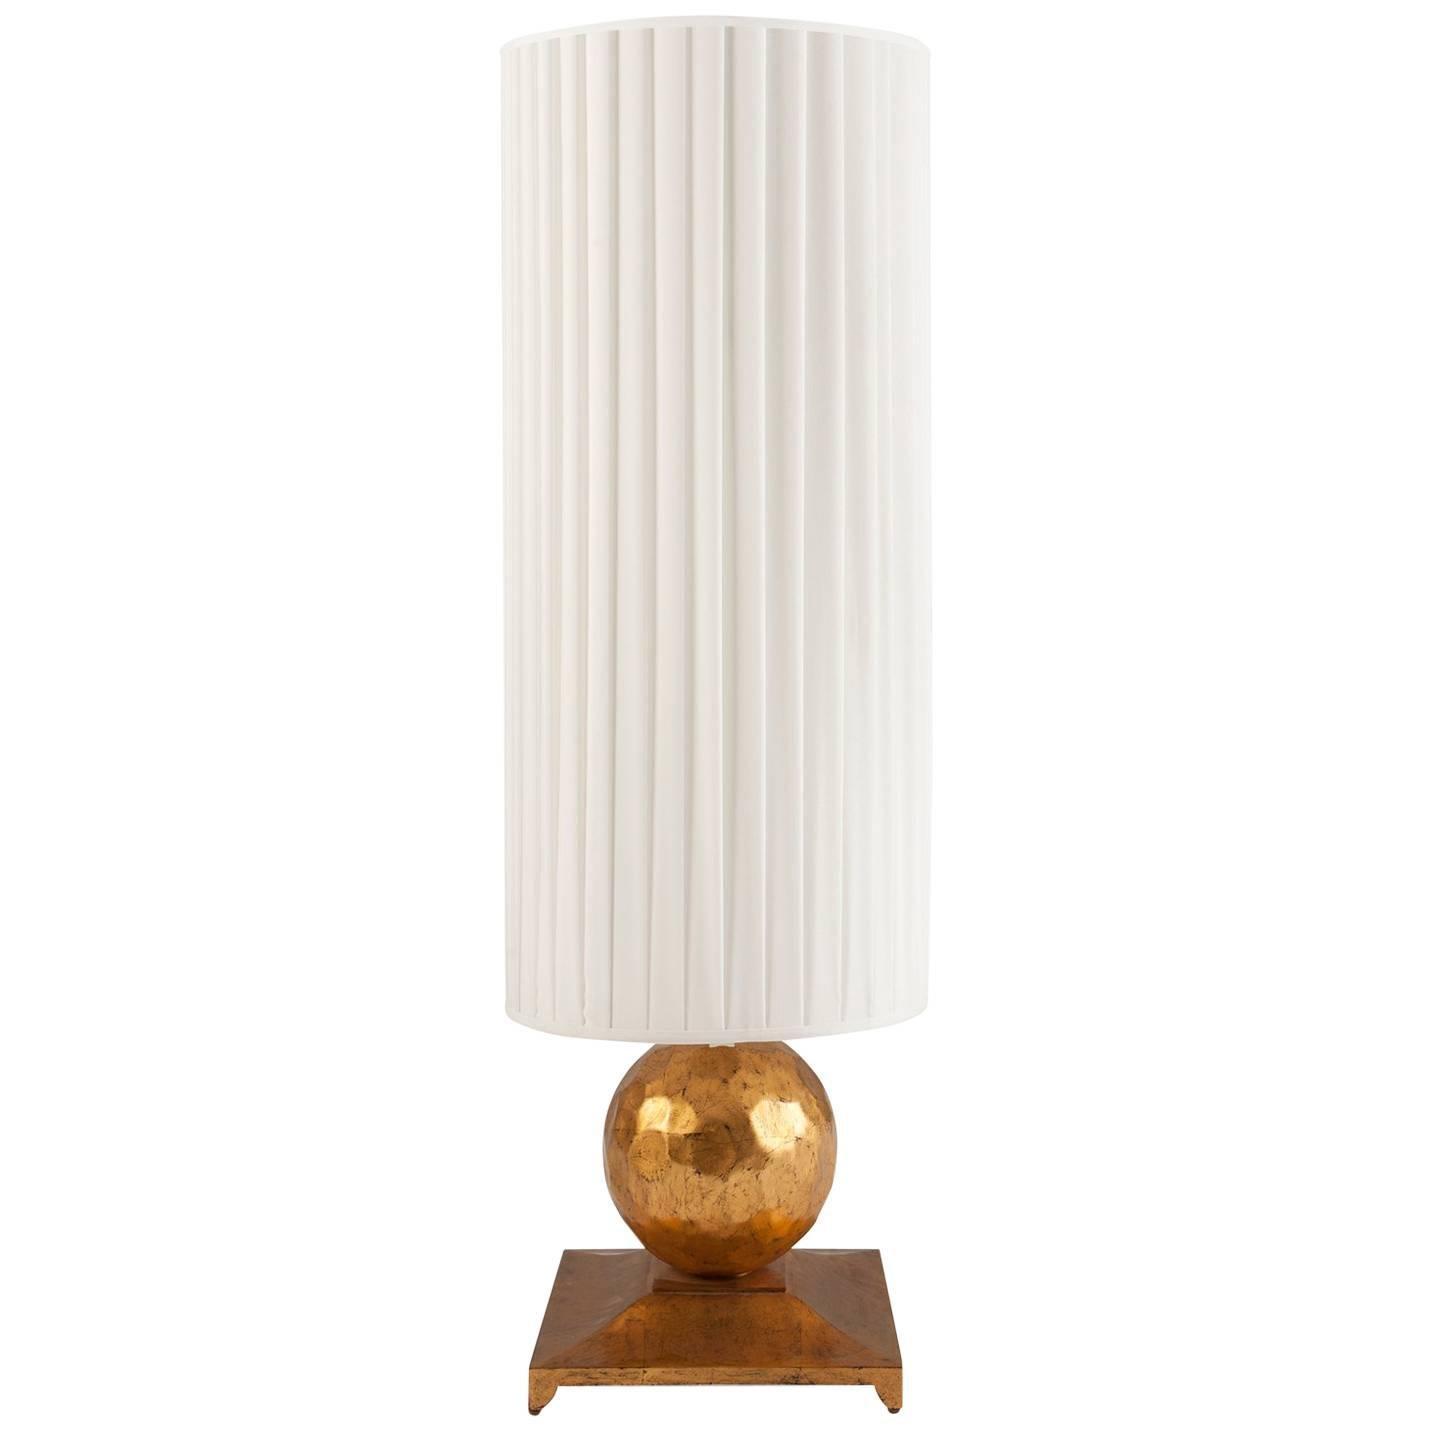 Turner Table Lamp in Oro Nero Gold Finish